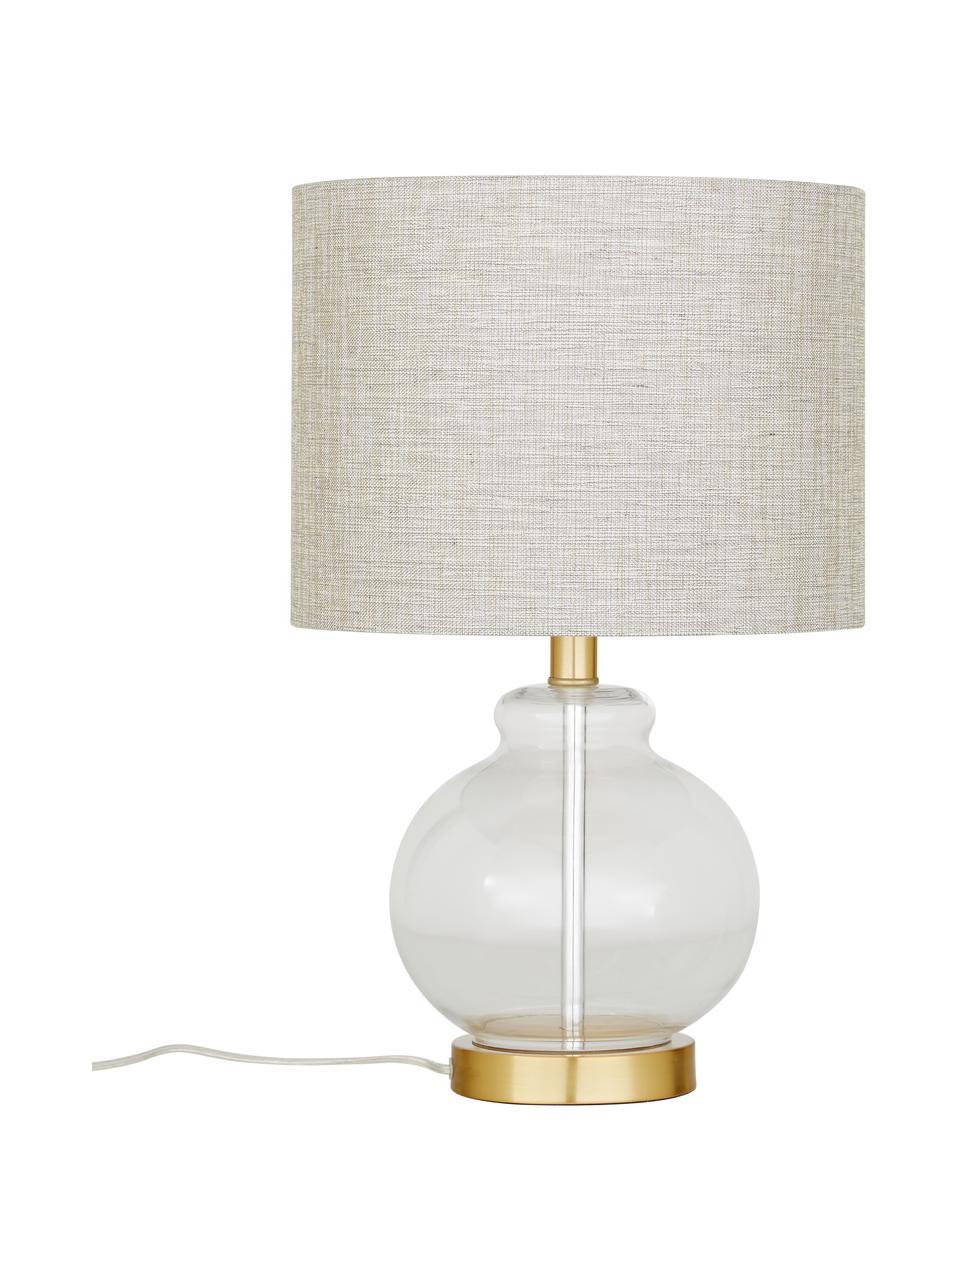 Tischlampe Natty mit Glasfuß, Lampenschirm: Textil, Lampenfuß: Glas, Sockel: Messing, gebürstet, Taupe, Transparent, Ø 31 x H 48 cm